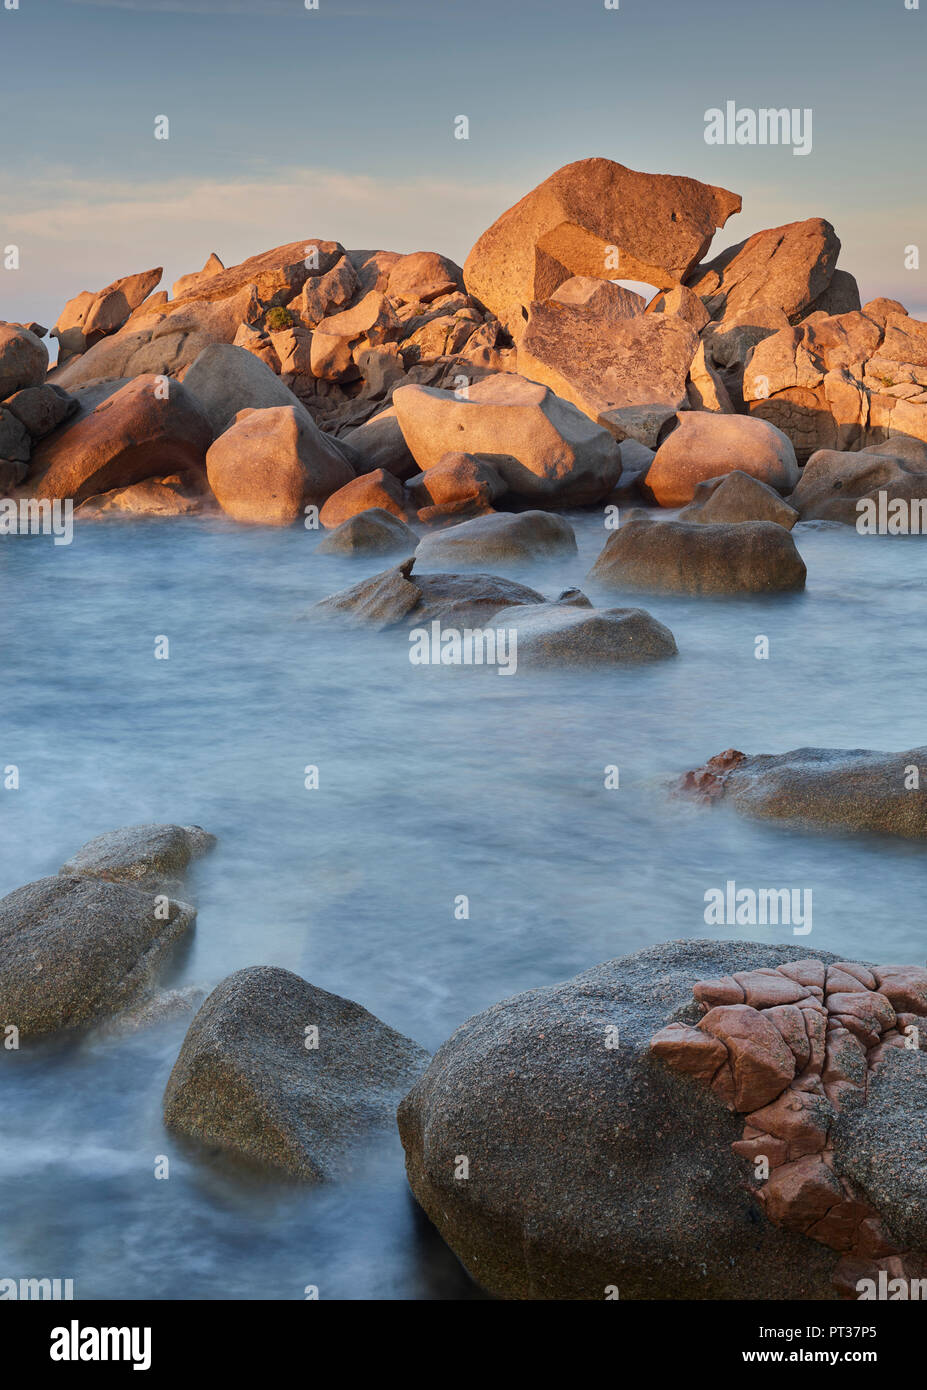 Felsen am Strand von Palombaggia, Korsika, Frankreich Stockbild